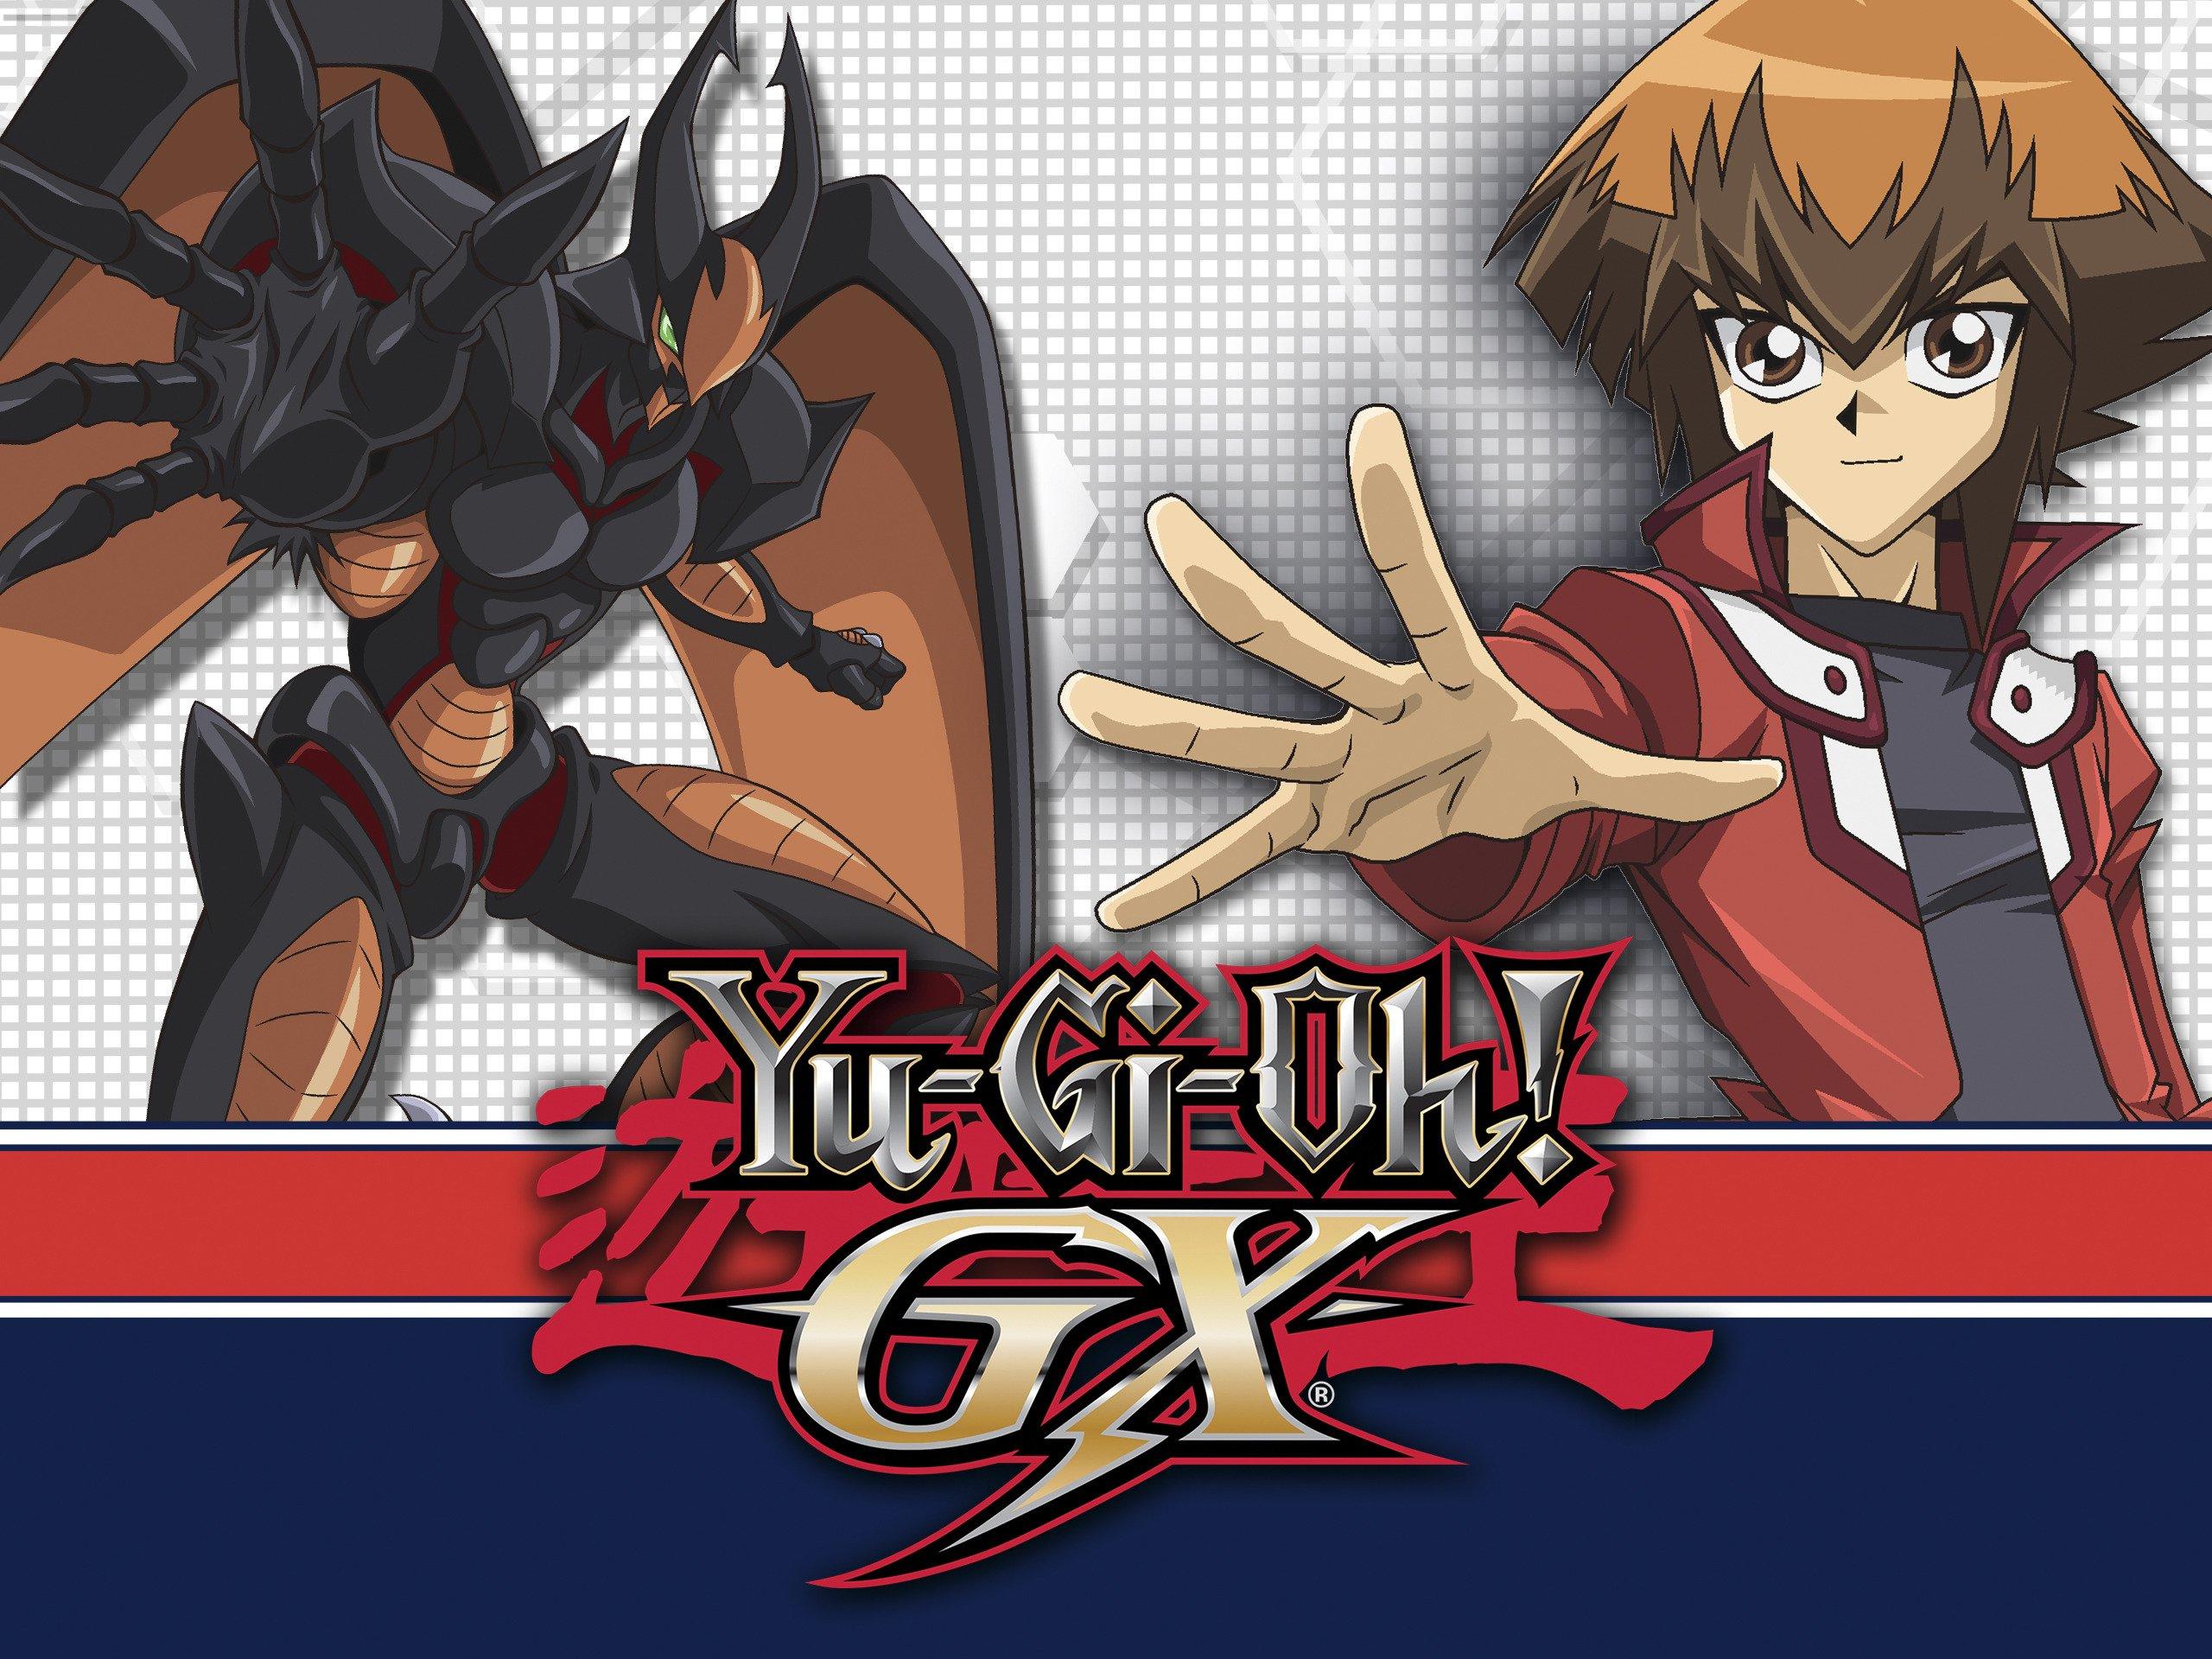 yugioh gx season 2 free download